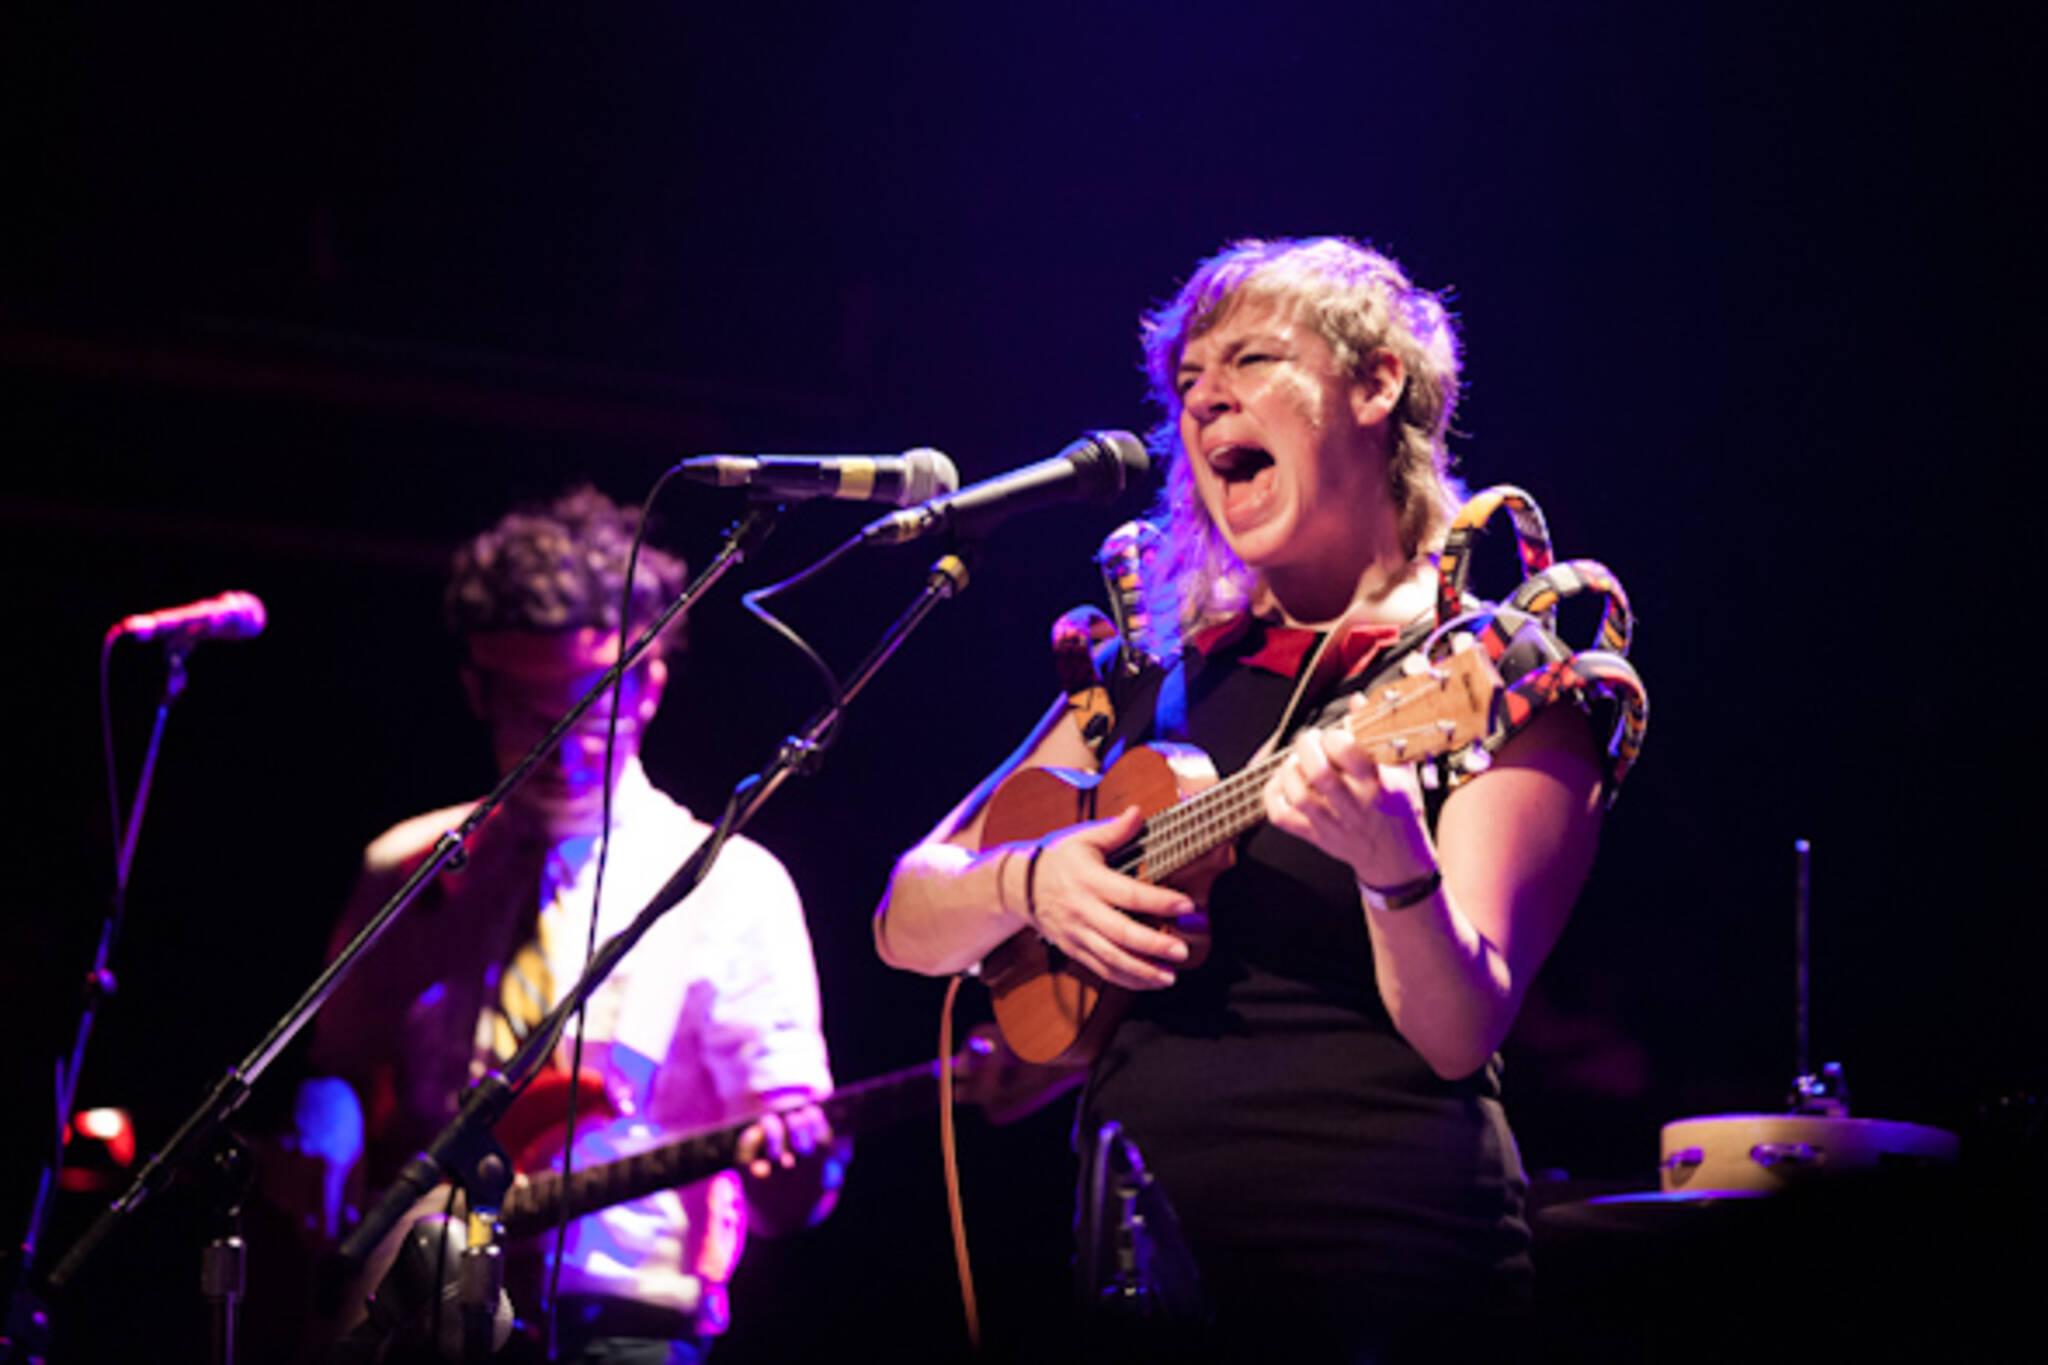 East Live Music Venues Toronto